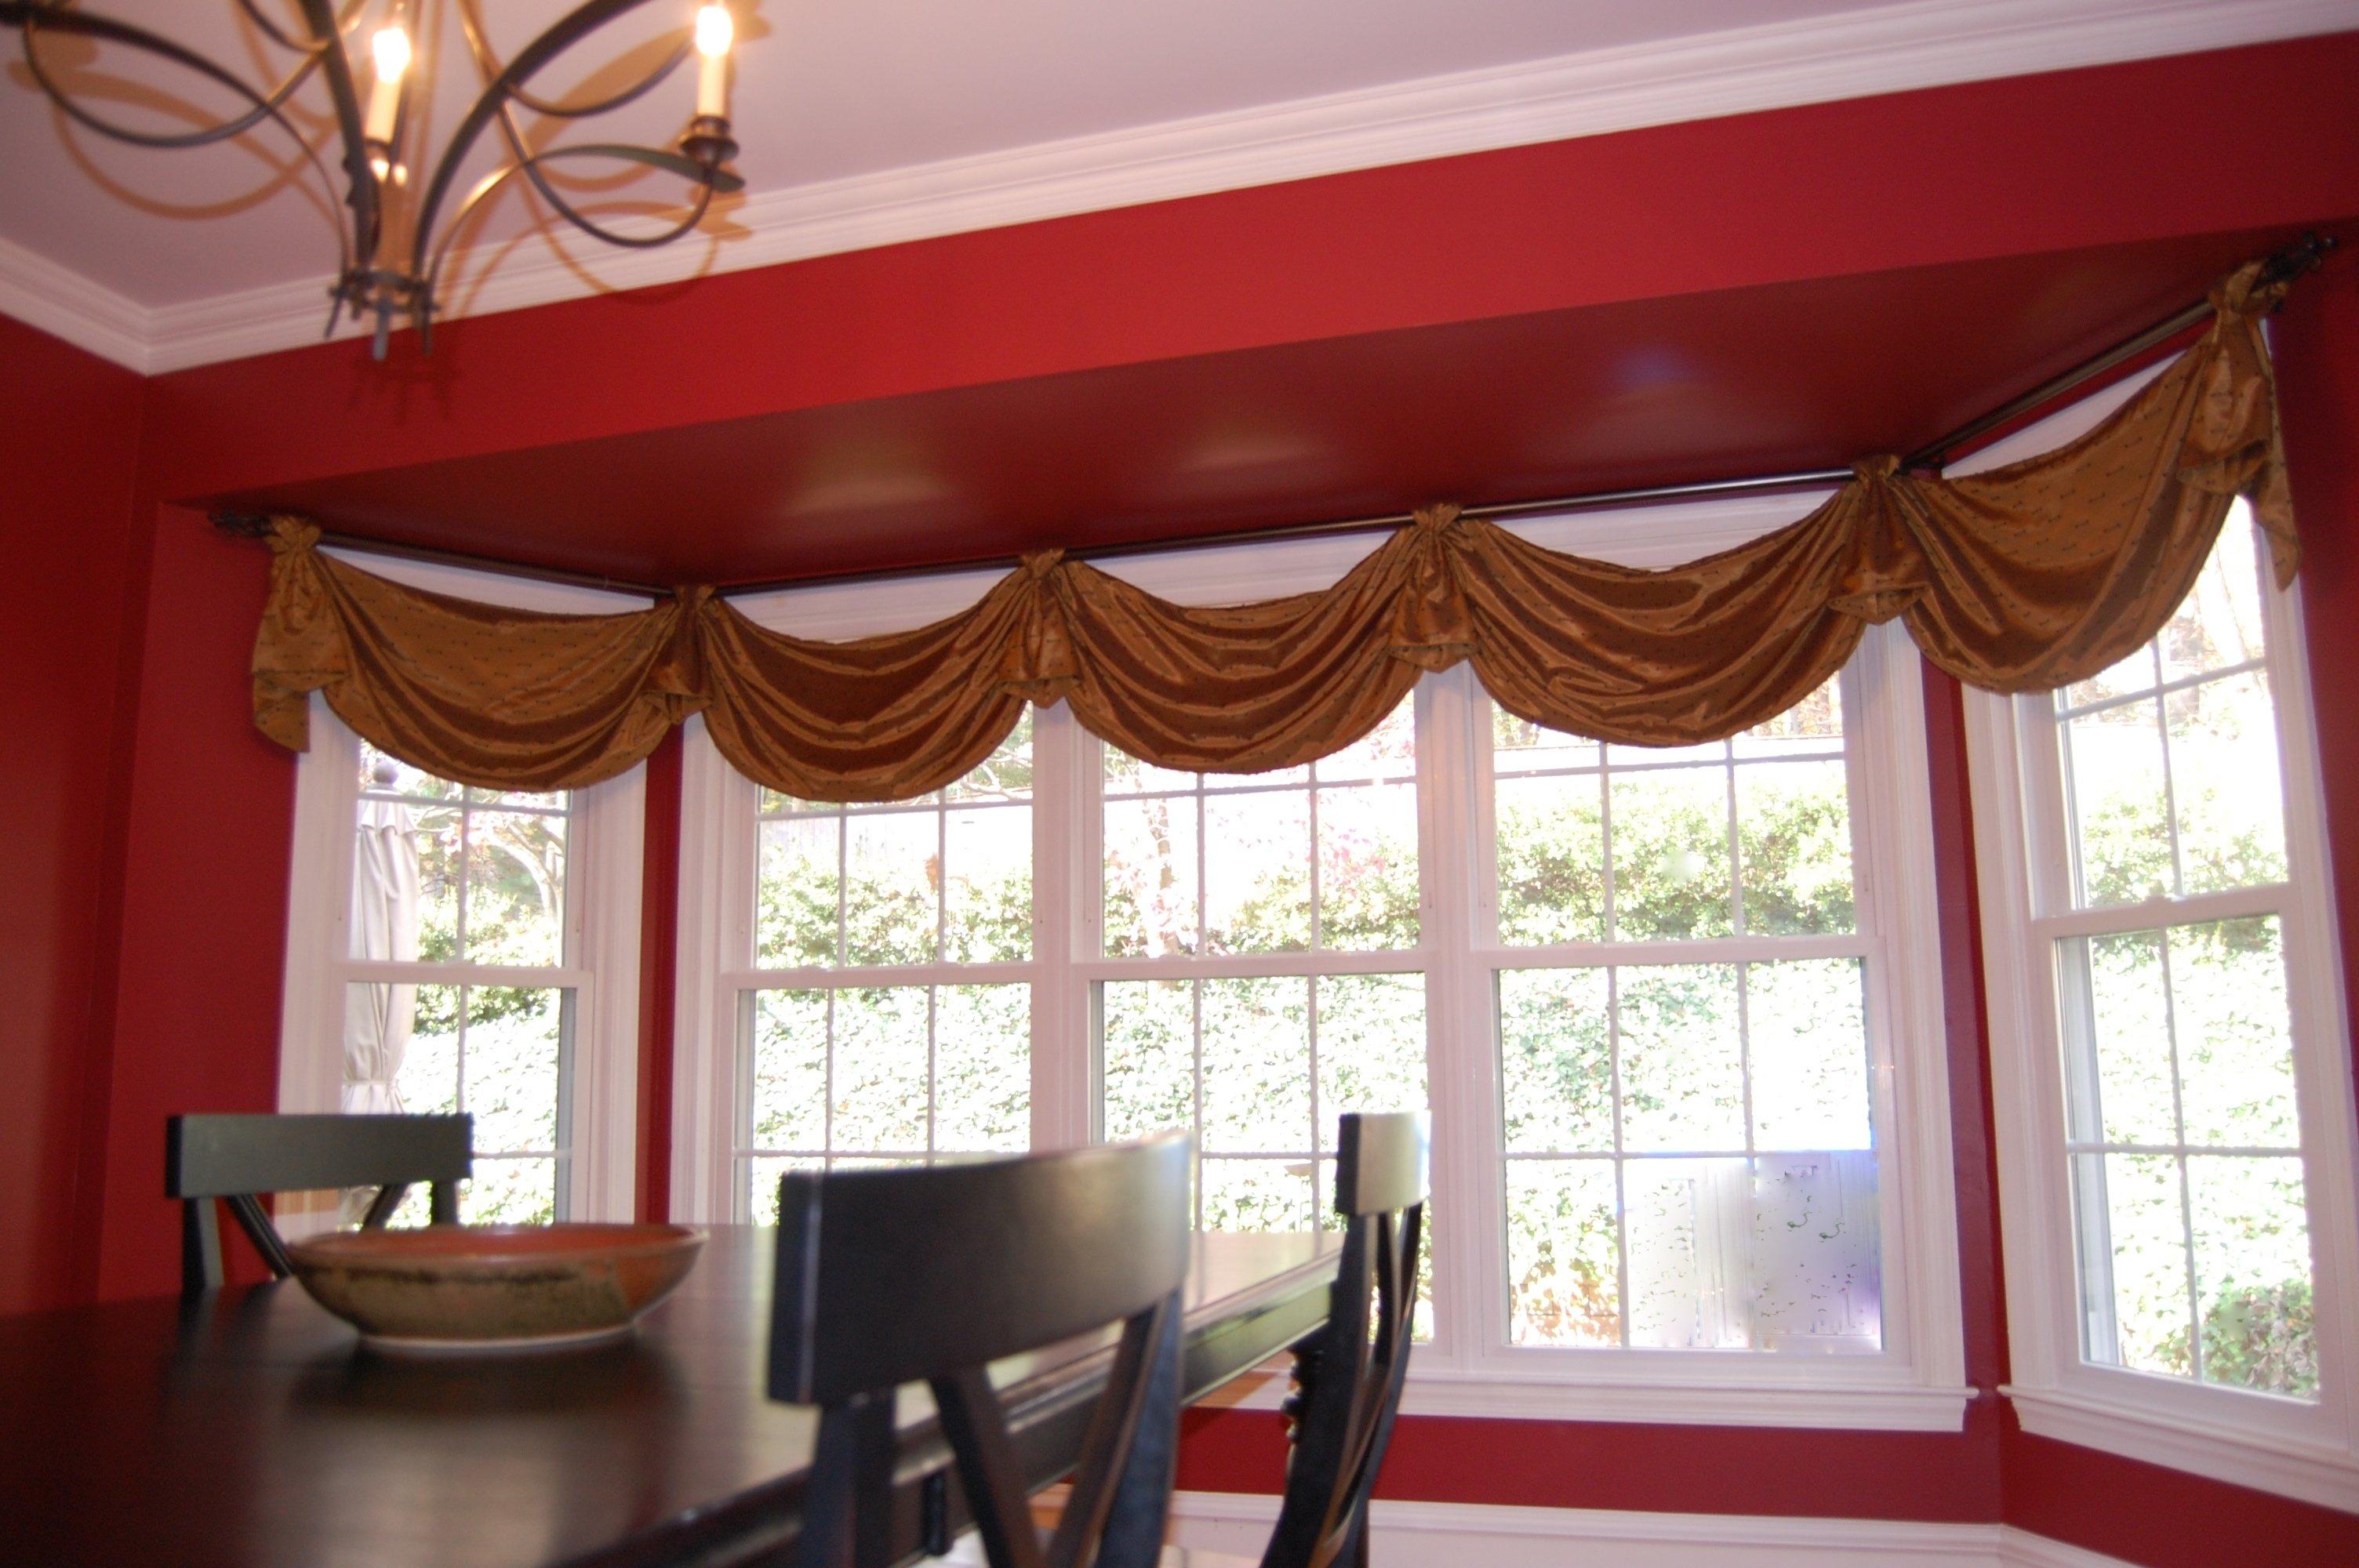 10 Stylish Valance Ideas For Large Windows fresh design window curtain box ideas curtains 2020